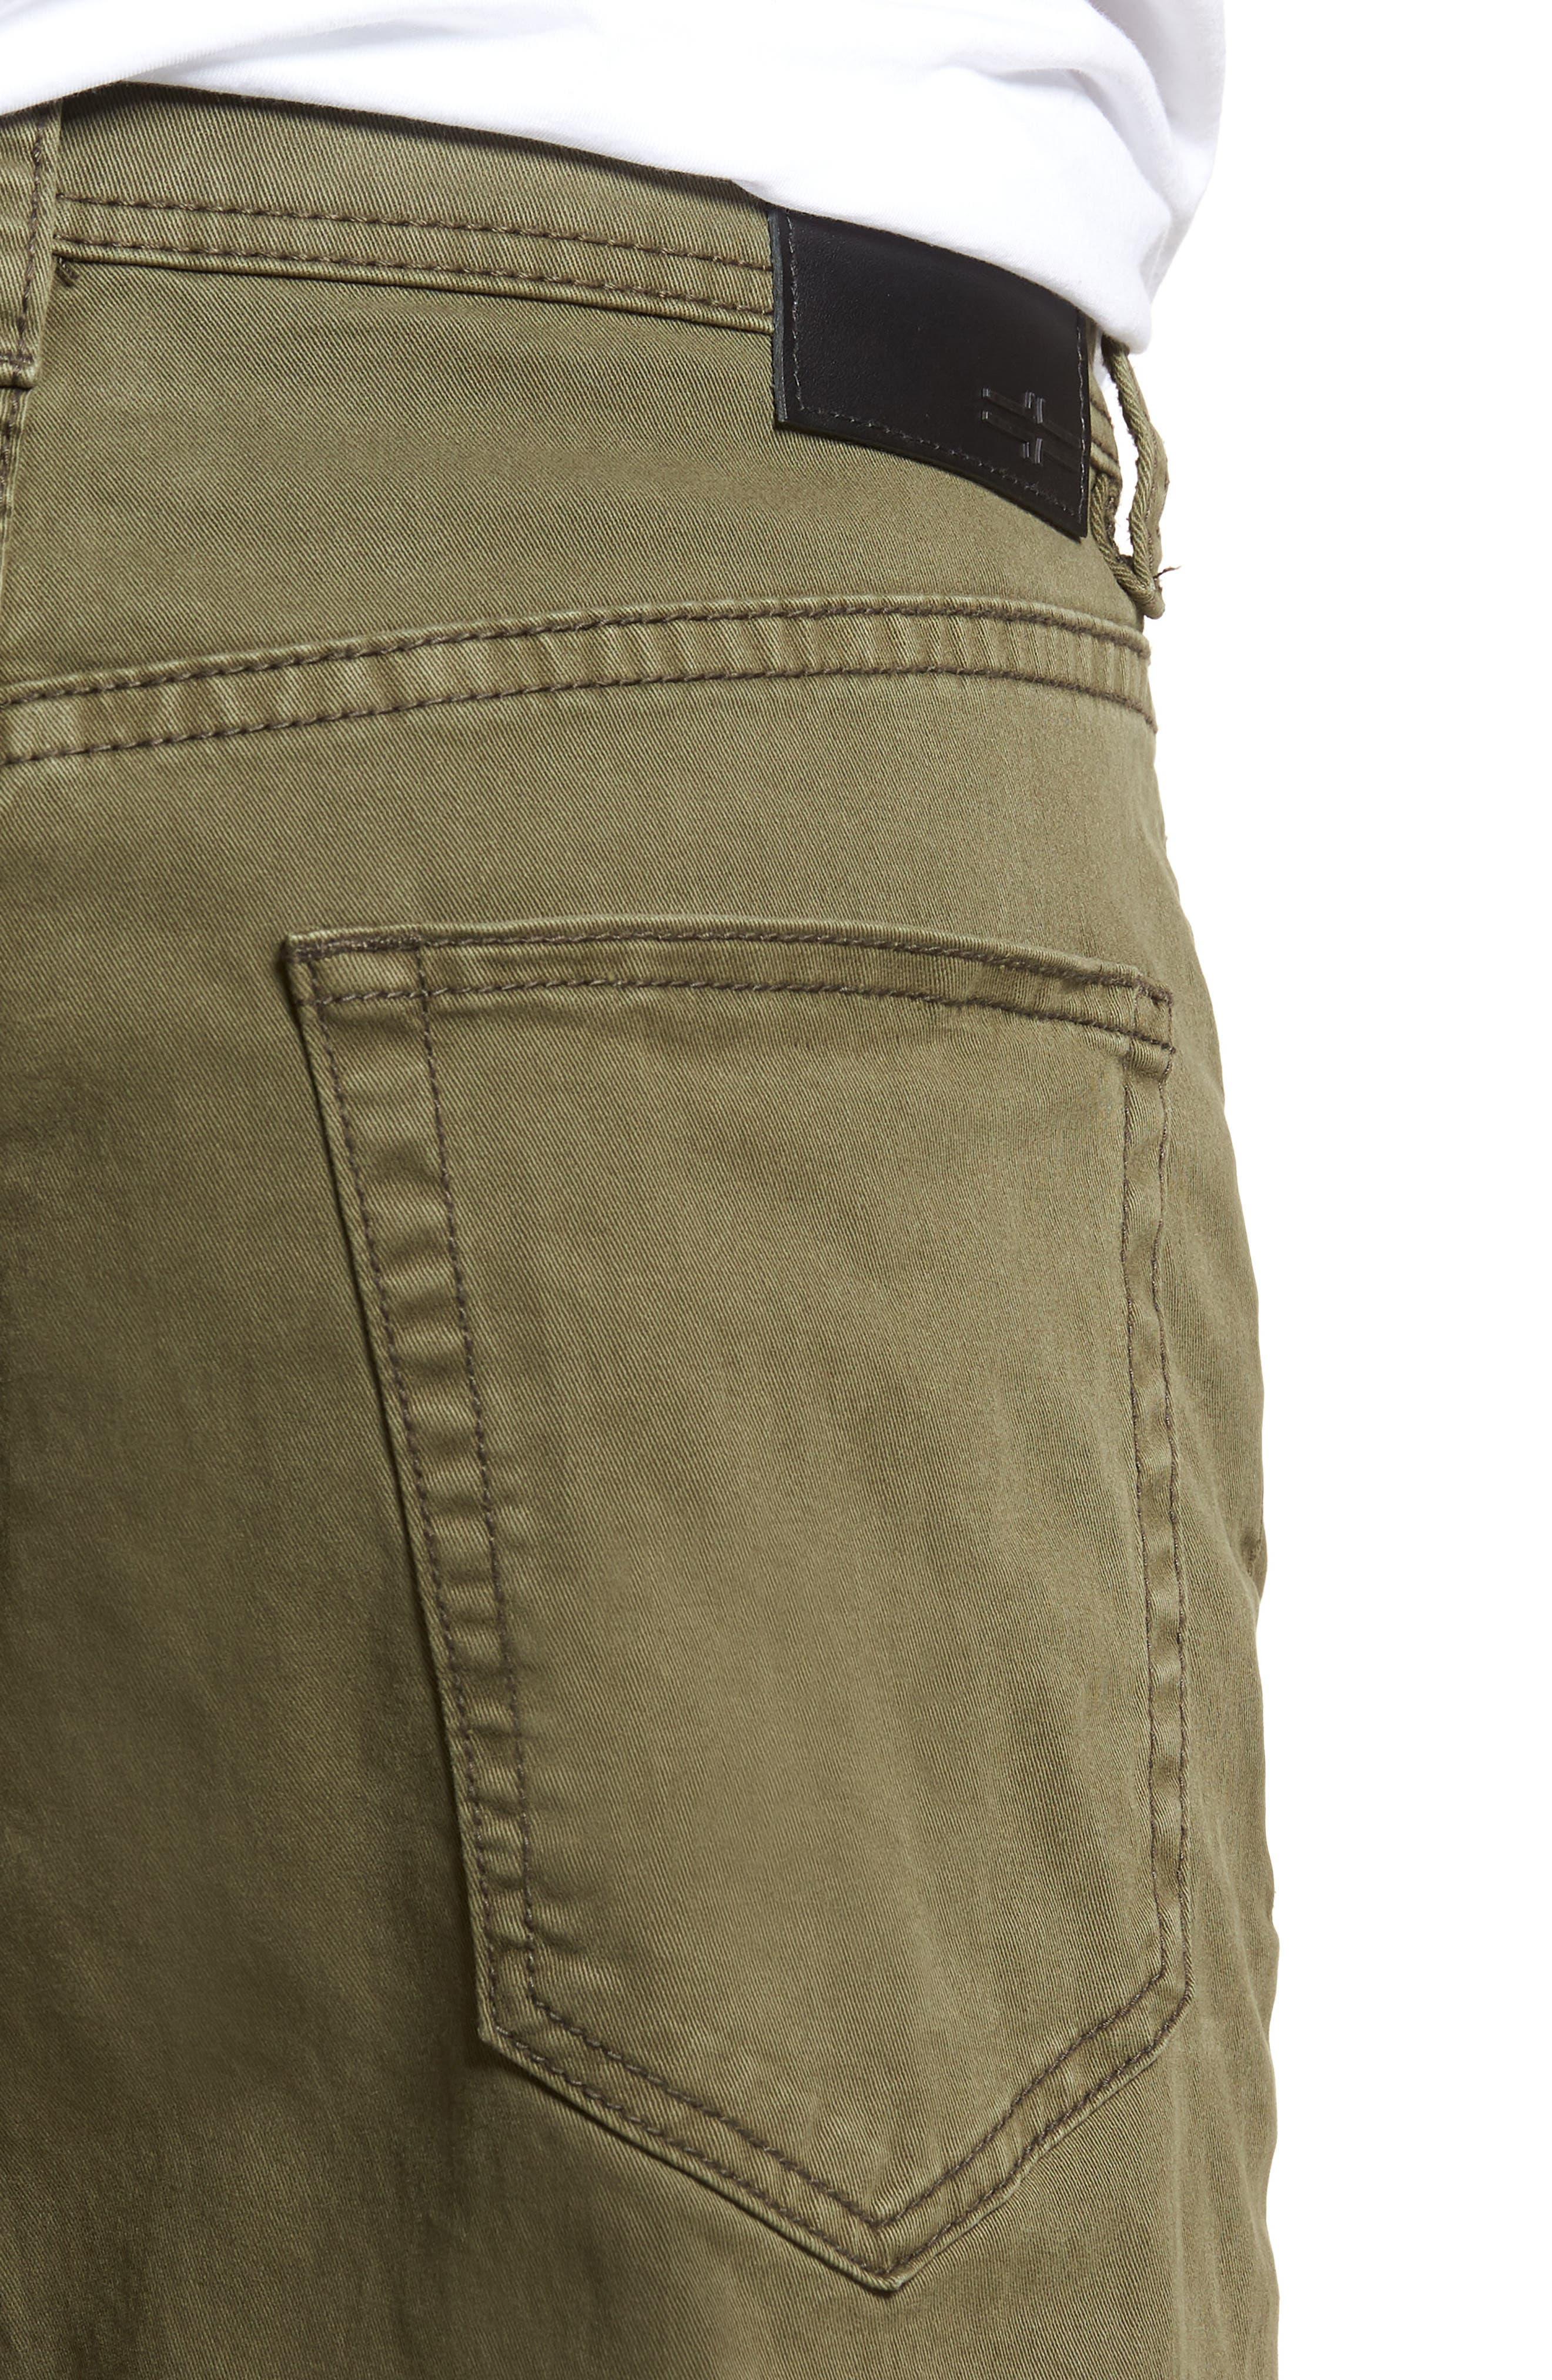 Jeans Co. Kingston Slim Straight Leg Jeans,                             Alternate thumbnail 4, color,                             Olive Night